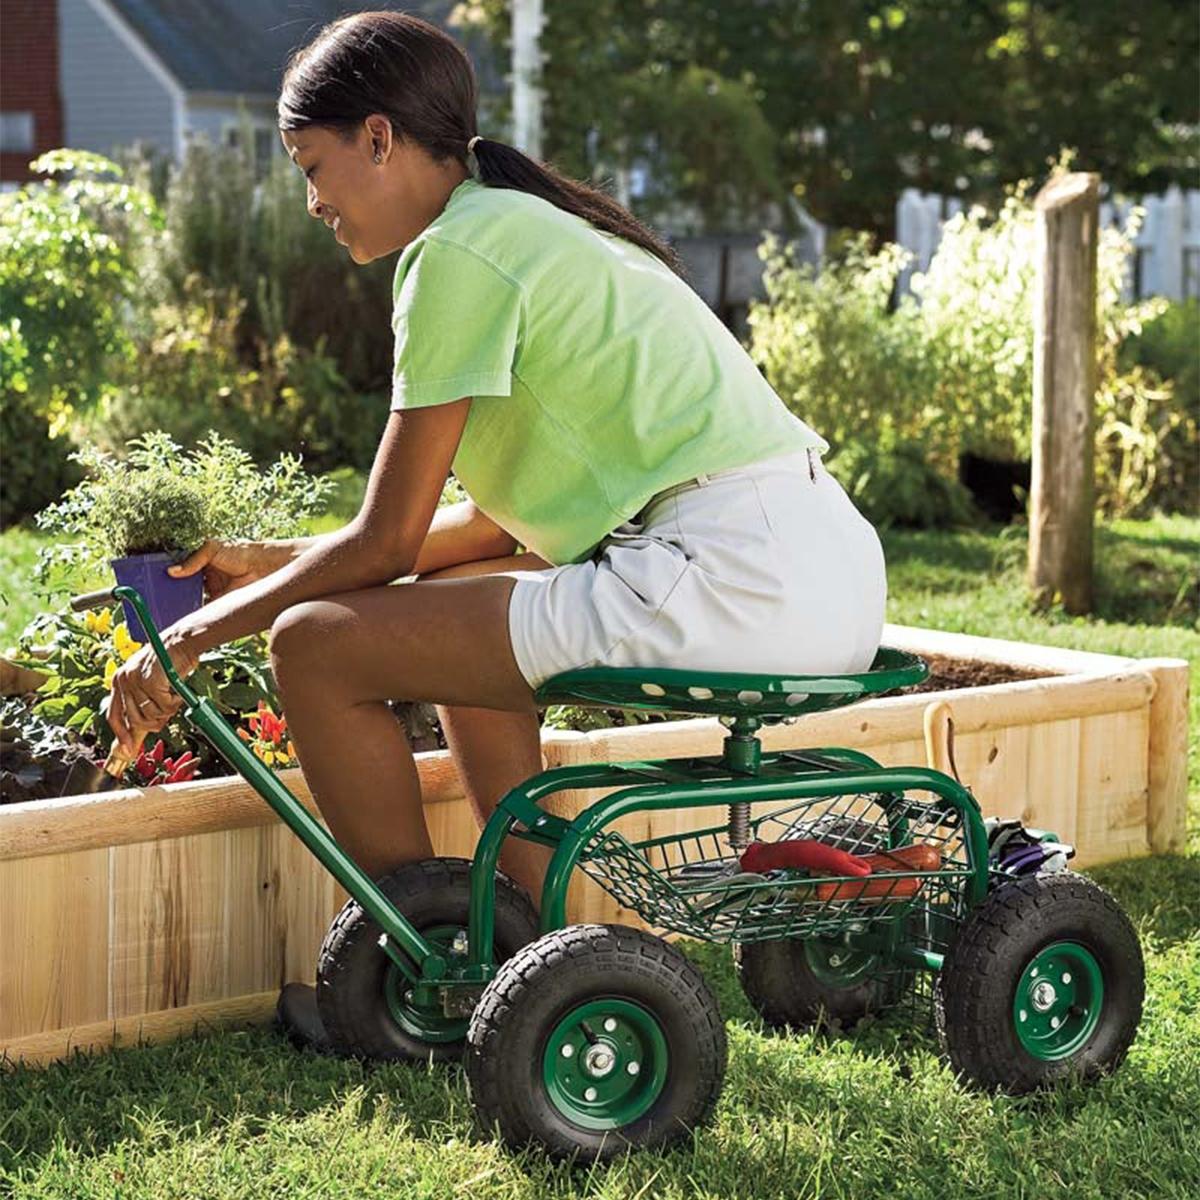 Green Rolling Scoot-N-Do Garden Seat